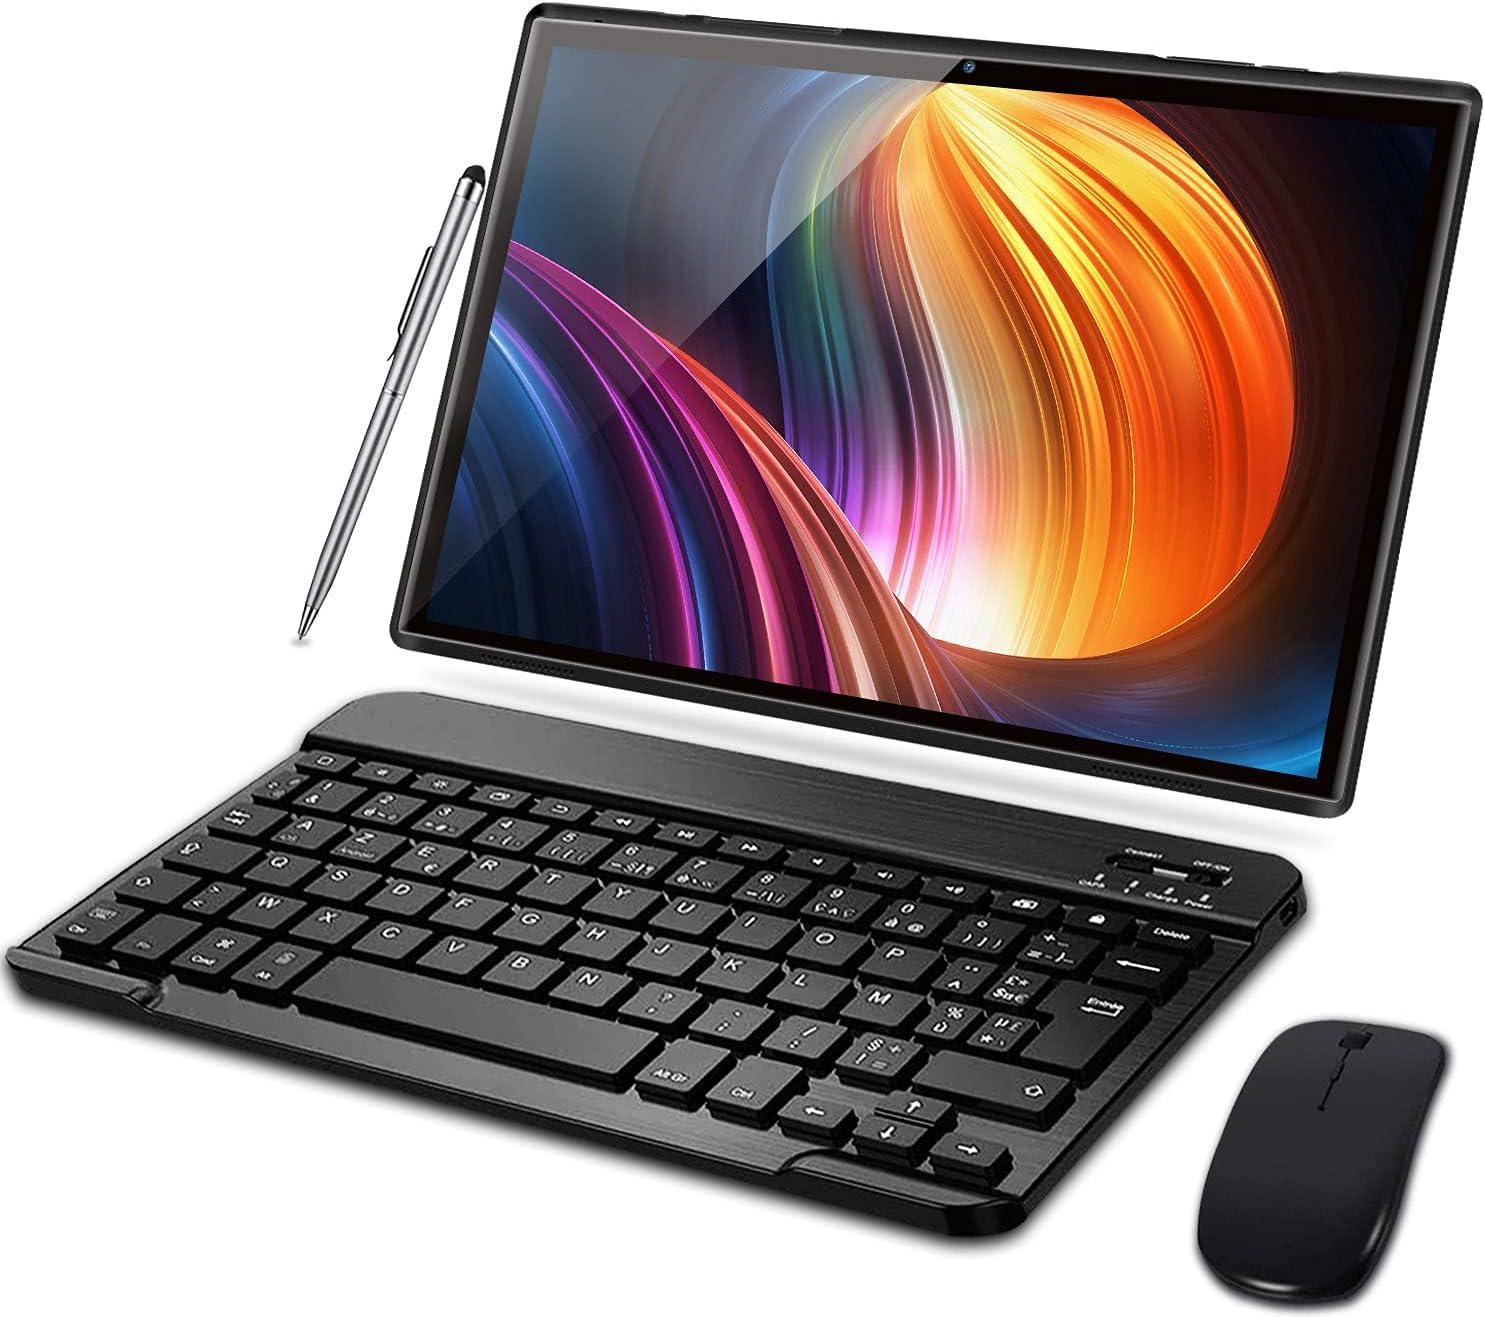 Tablet 10 Pulgadas 3GB RAM 32GB ROM Android 10 Pro Tablets con Quad Core | Cámara Dual 5MP + 8 MP | Doble SIM | Batería 8000mAh | WiFi | Bluetooth | ...